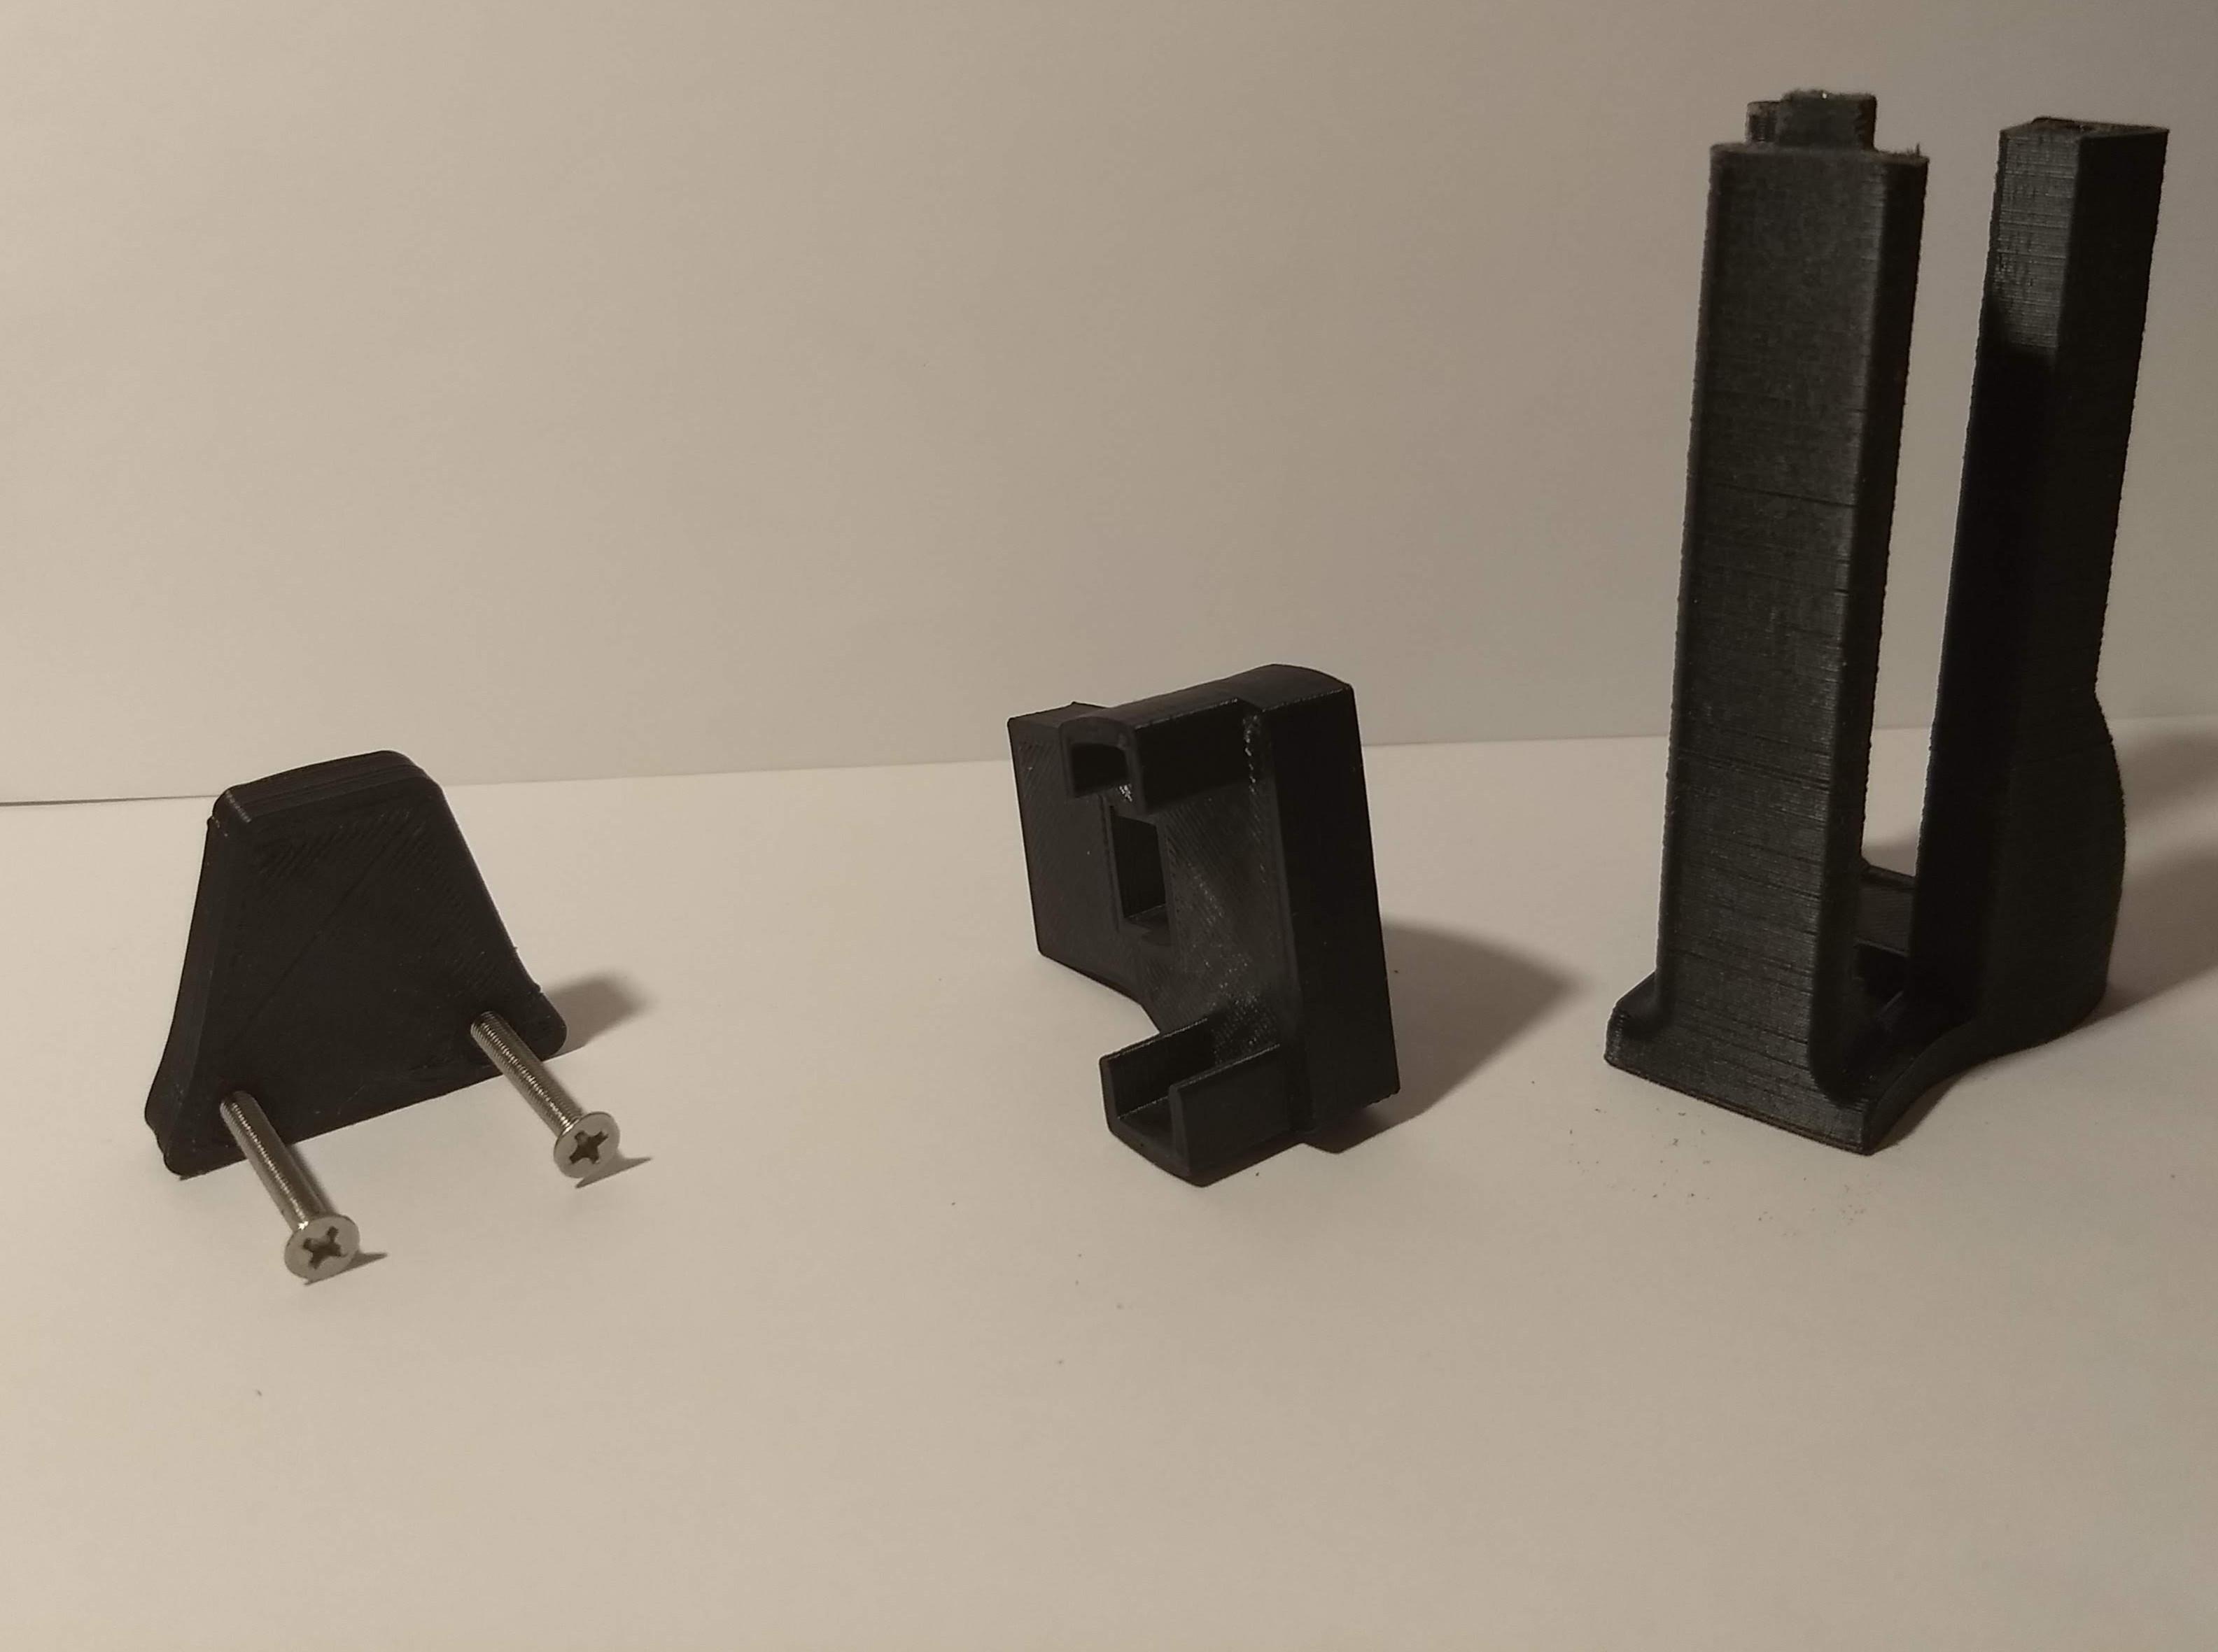 IMG_20190203_172840162.jpg Download free STL file Satnav holder • 3D printer template, EL3D